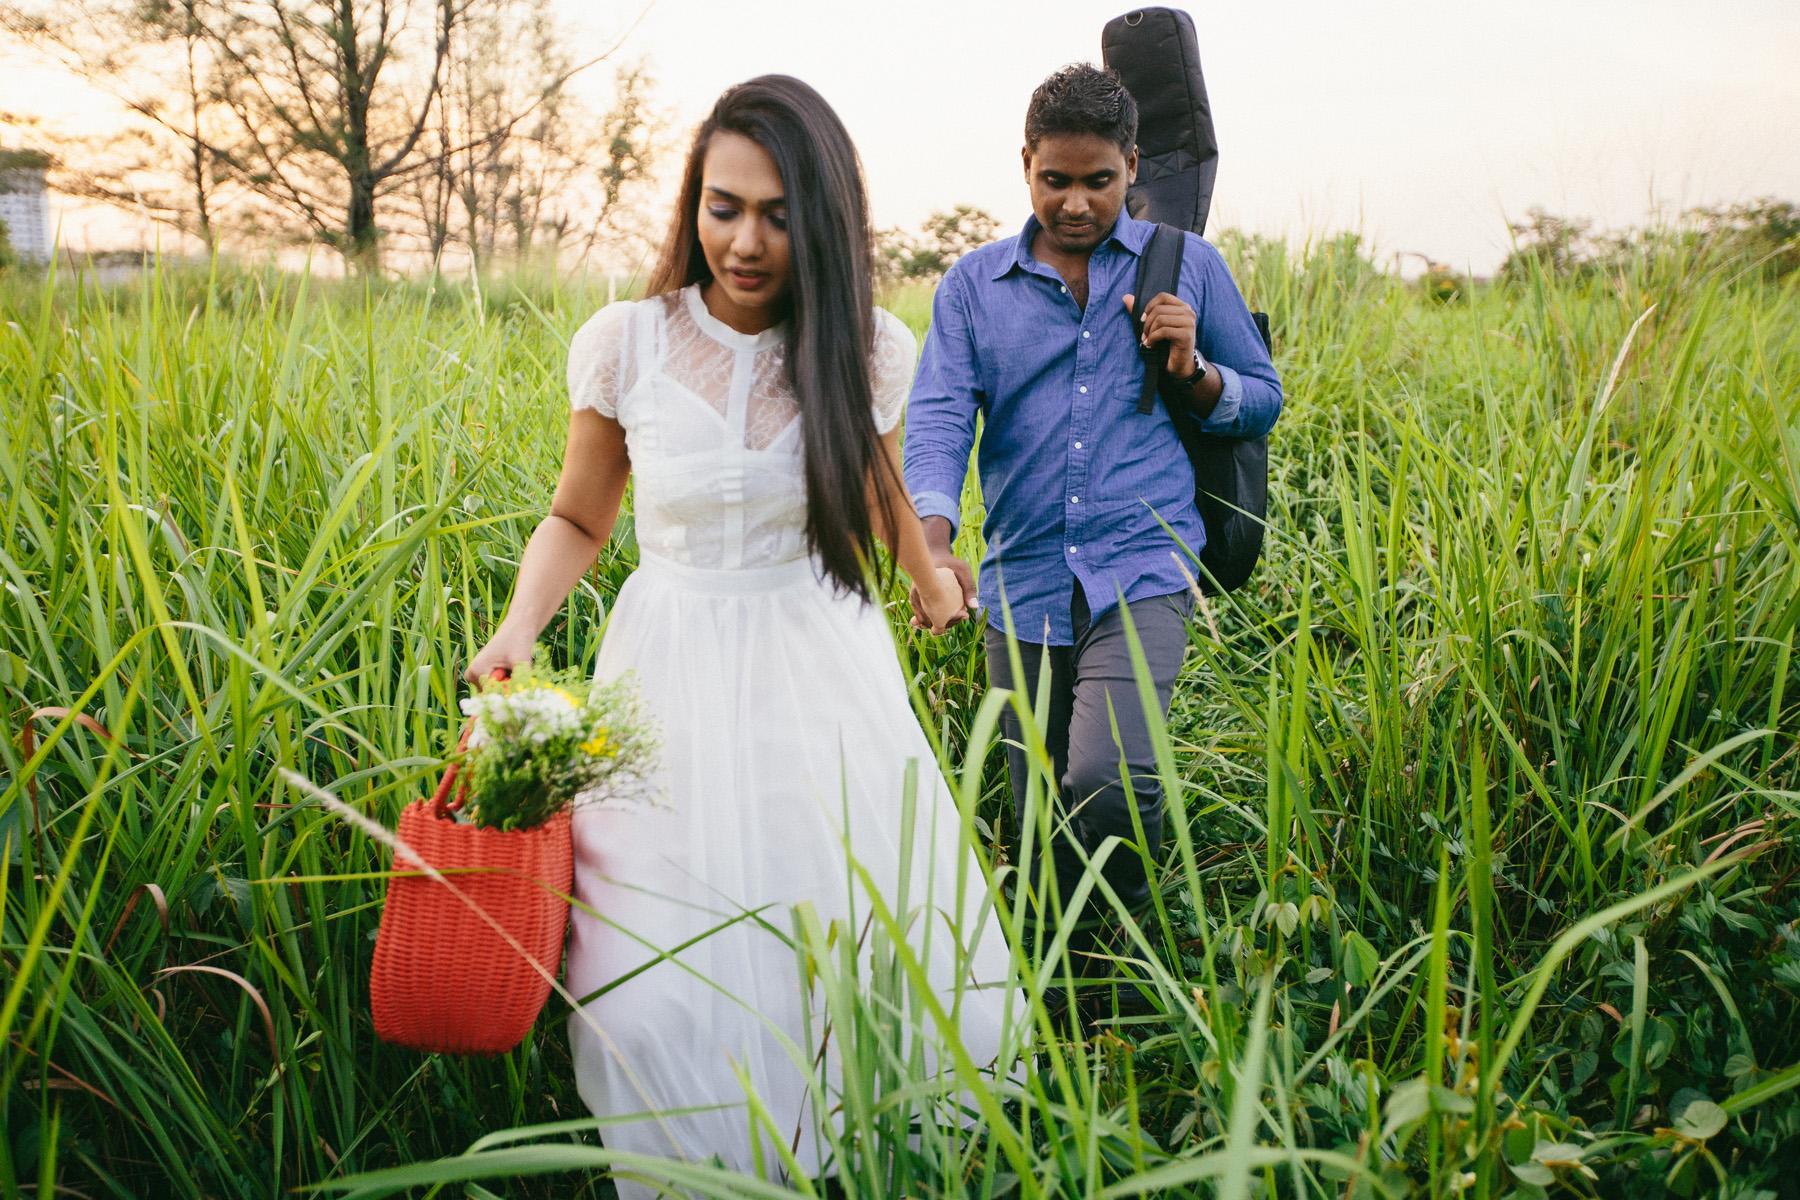 singapore-wedding-travel-photographer-abigail-caleb-wedding-wmt-09.jpg